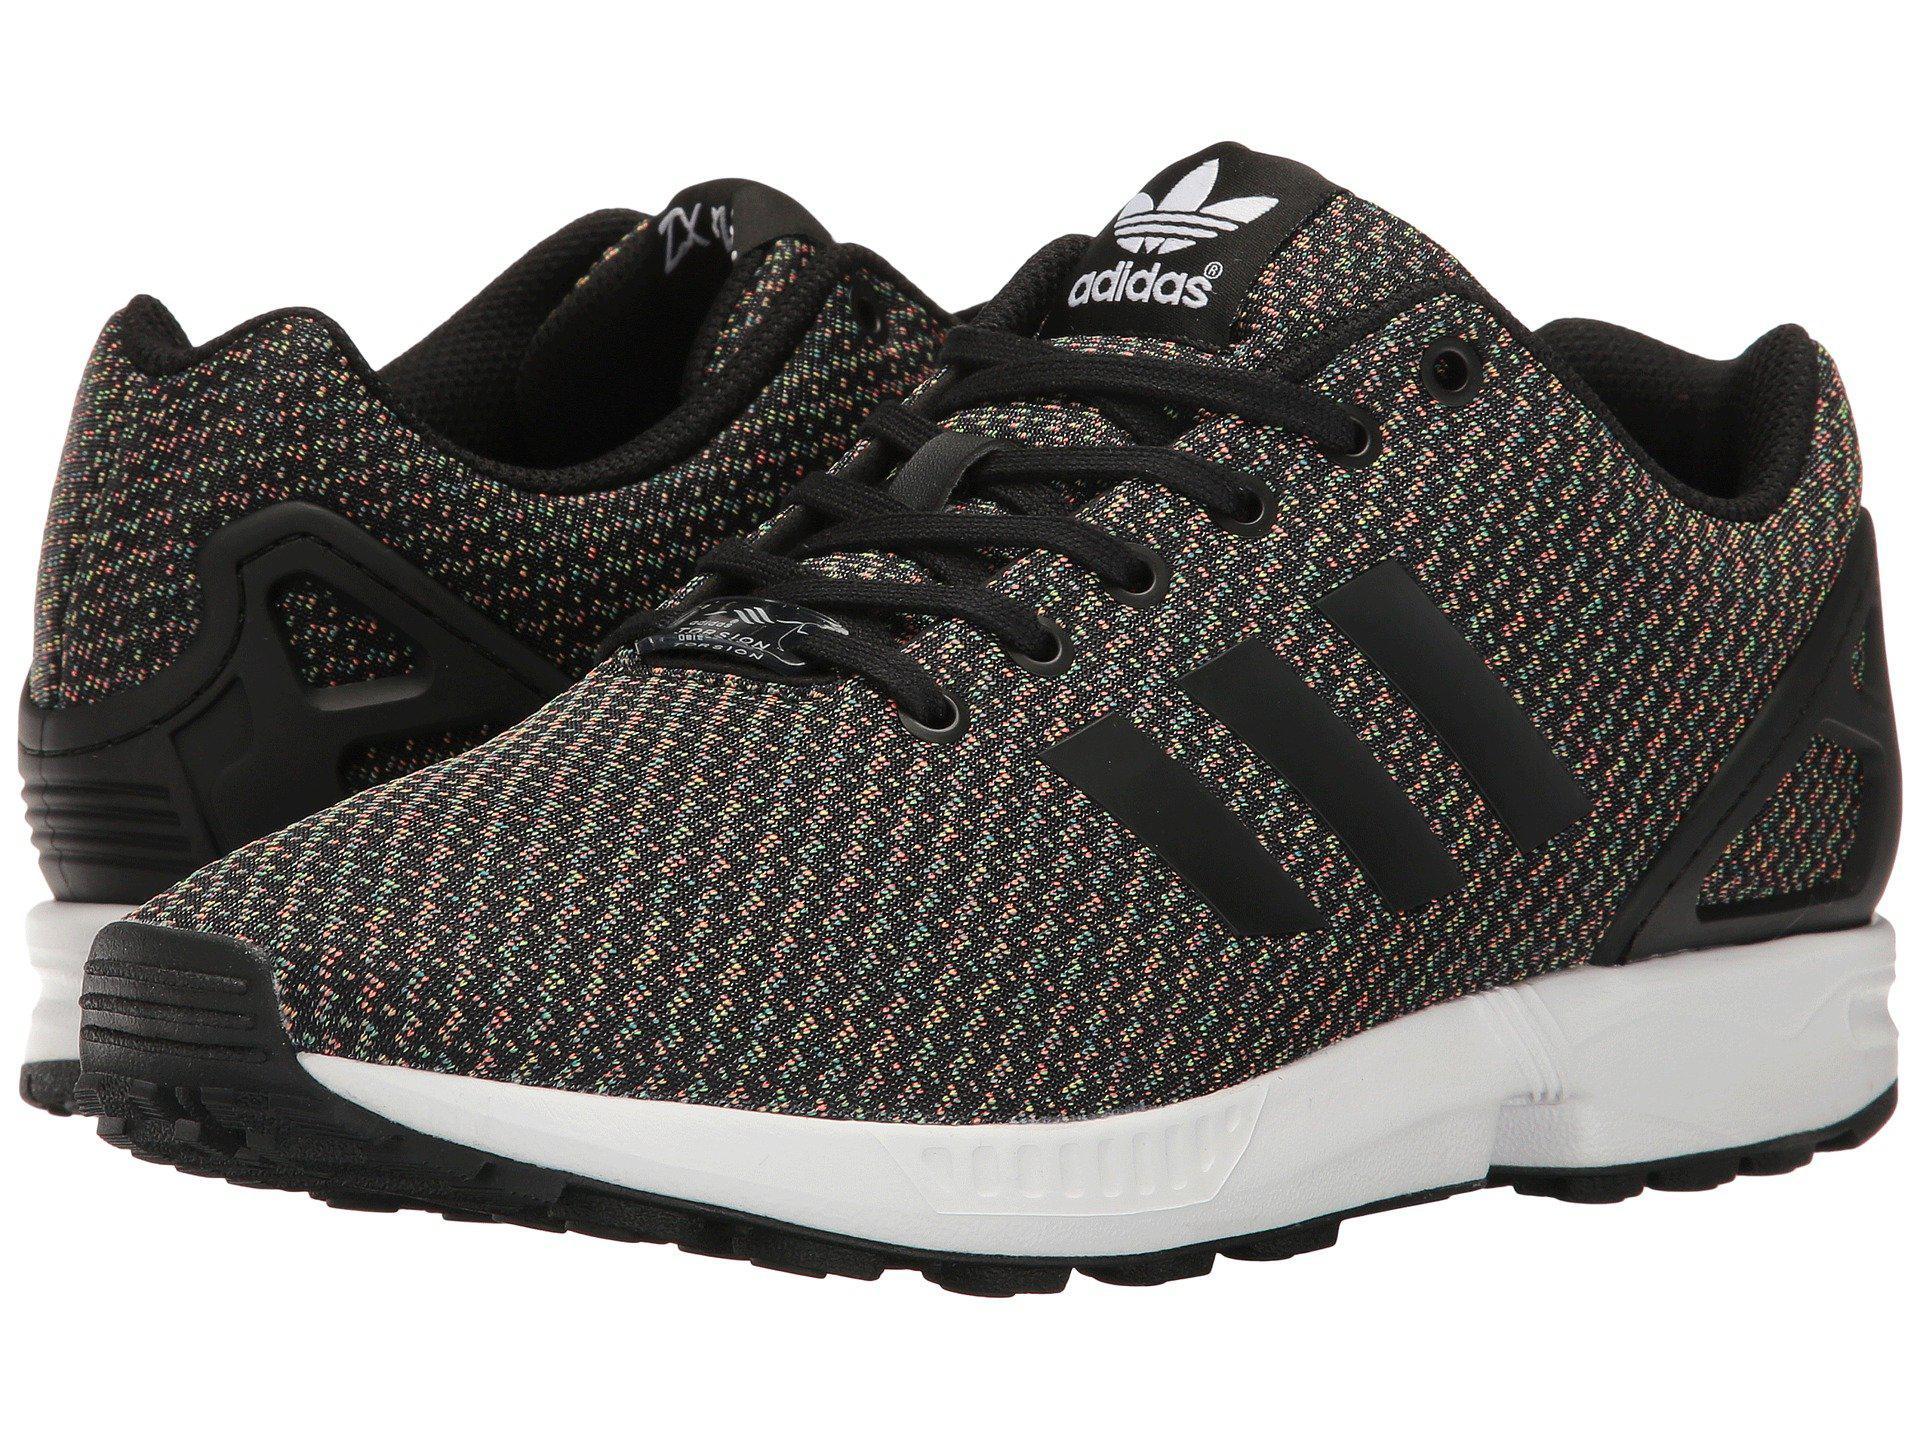 size 40 f46df d09a3 adidas Originals Zx Flux - Multicolor Knit in Black for Men - Lyst